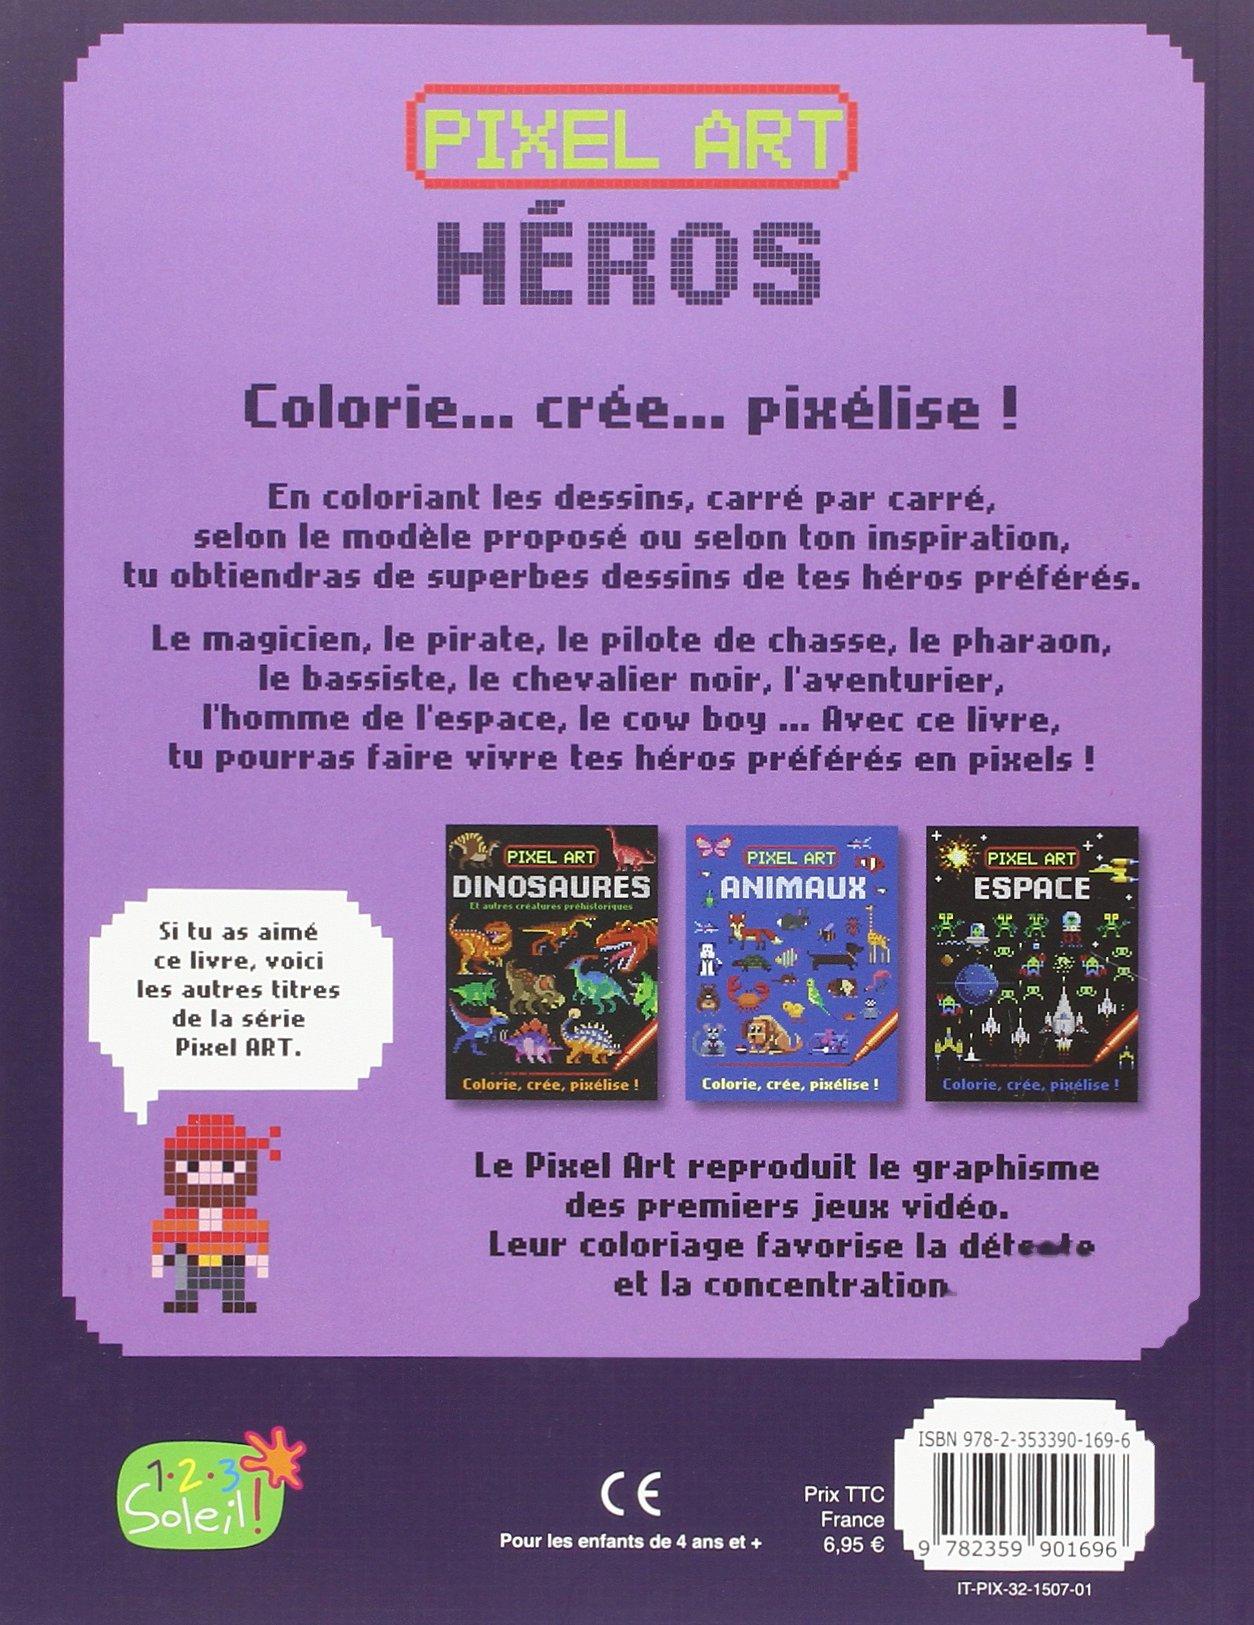 Amazonin Buy Pixel Art Heros Colorie Cree Pixelise